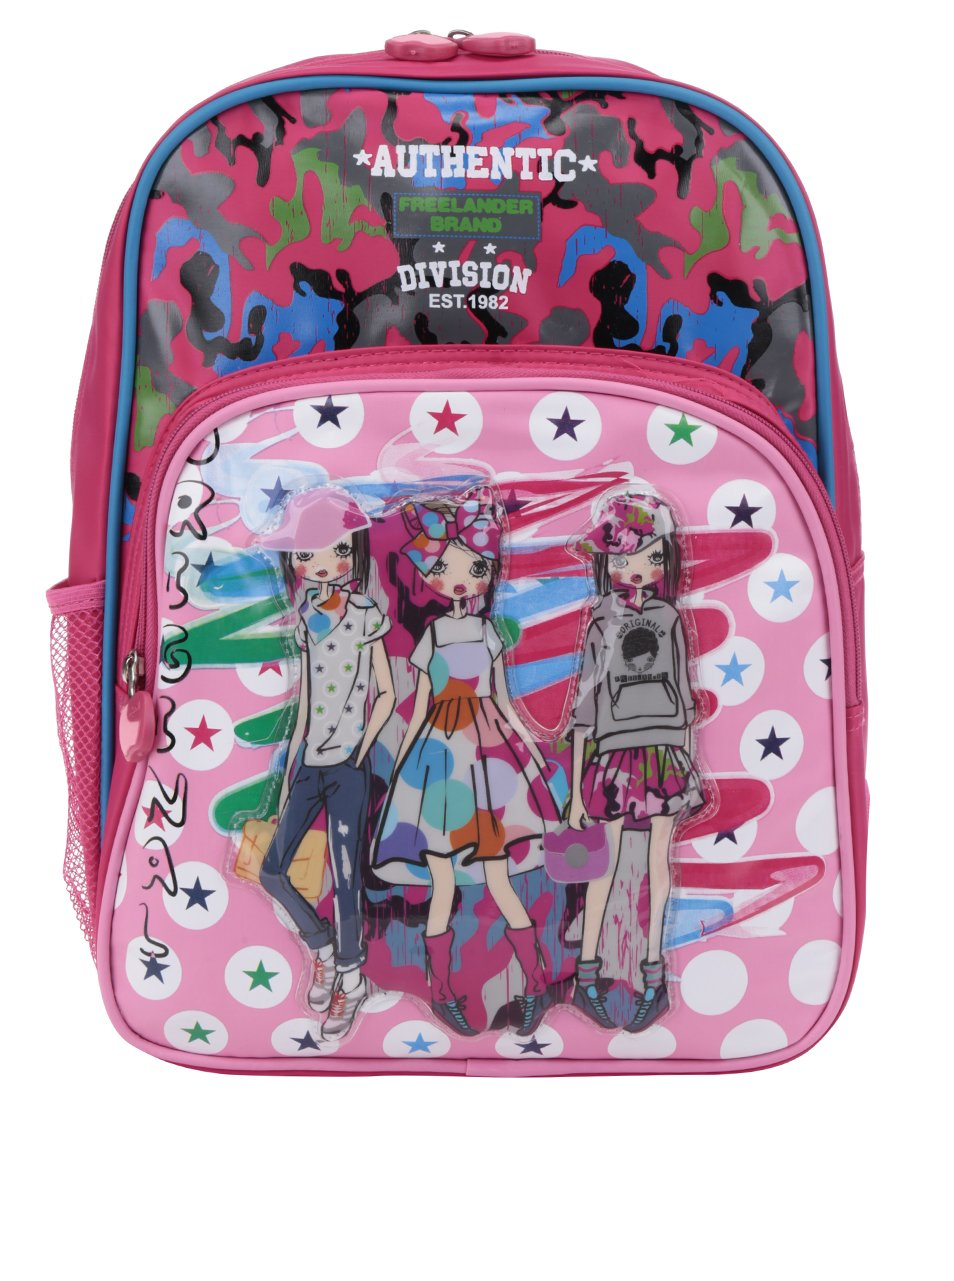 Růžový holčičí vzorovaný batoh s 3D potiskem Freelander Authentic Single